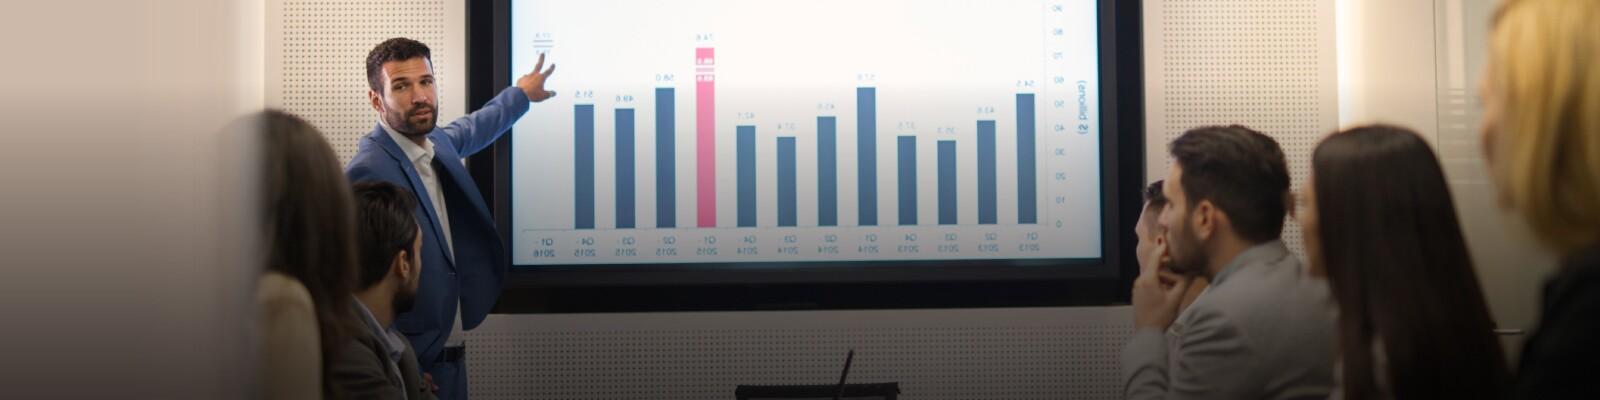 CareerOutlook-Showcase-1600x400.jpg